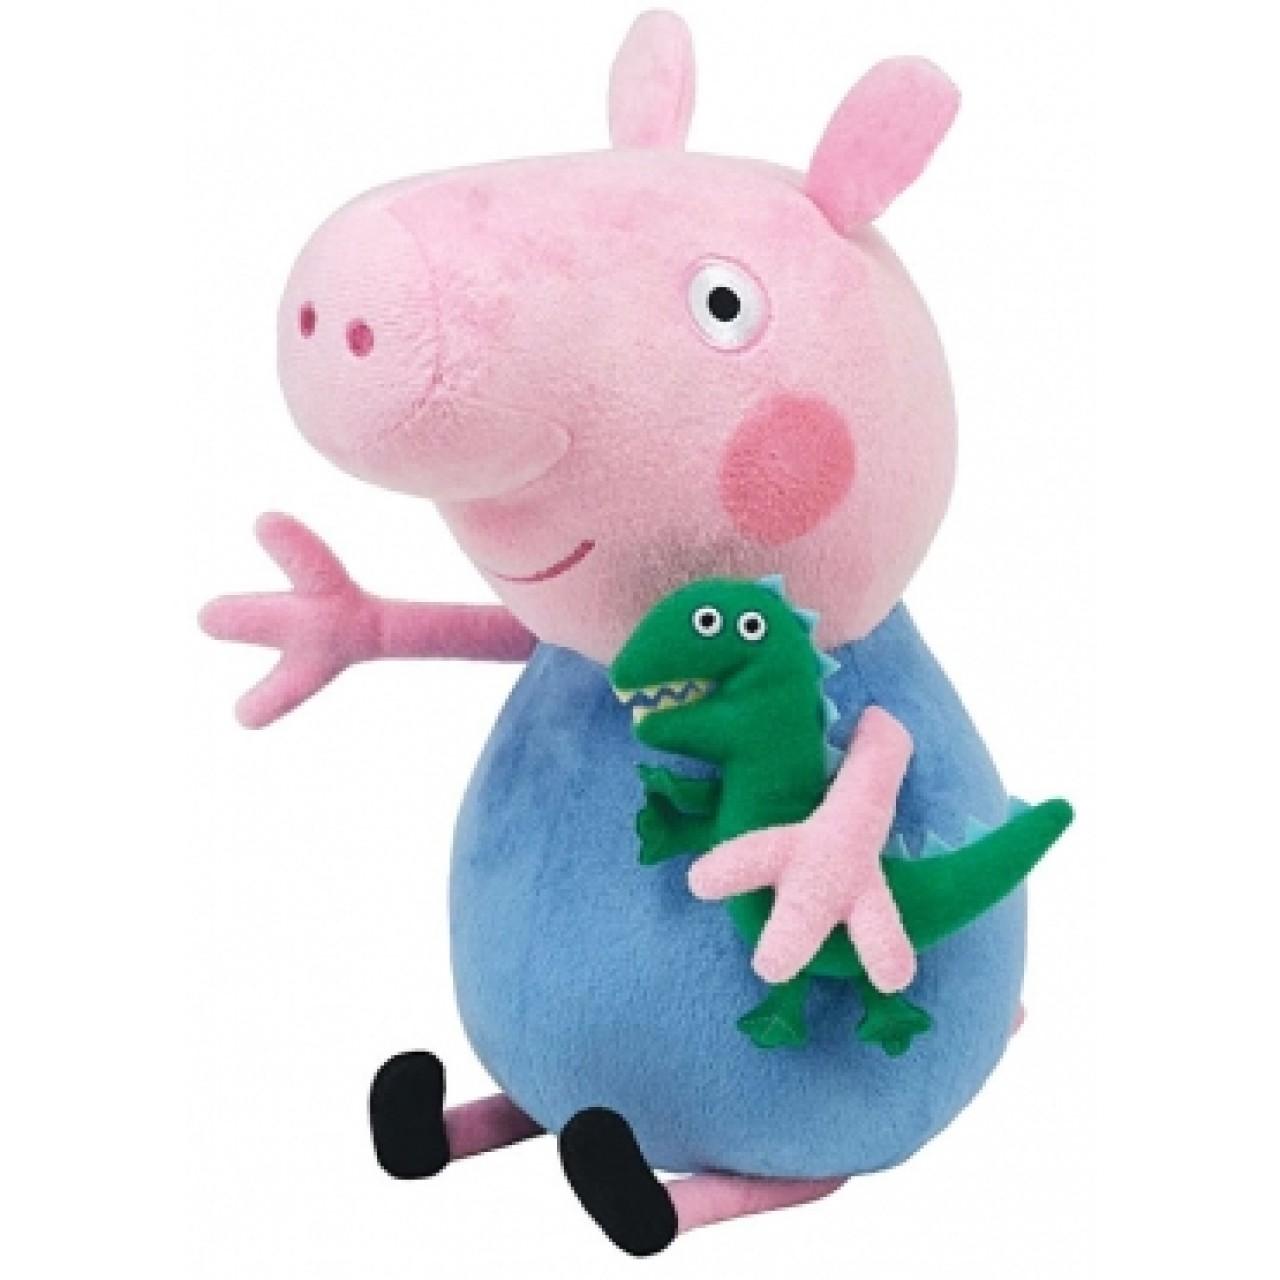 Мягкая Игрушка Peppa Pig - Джордж